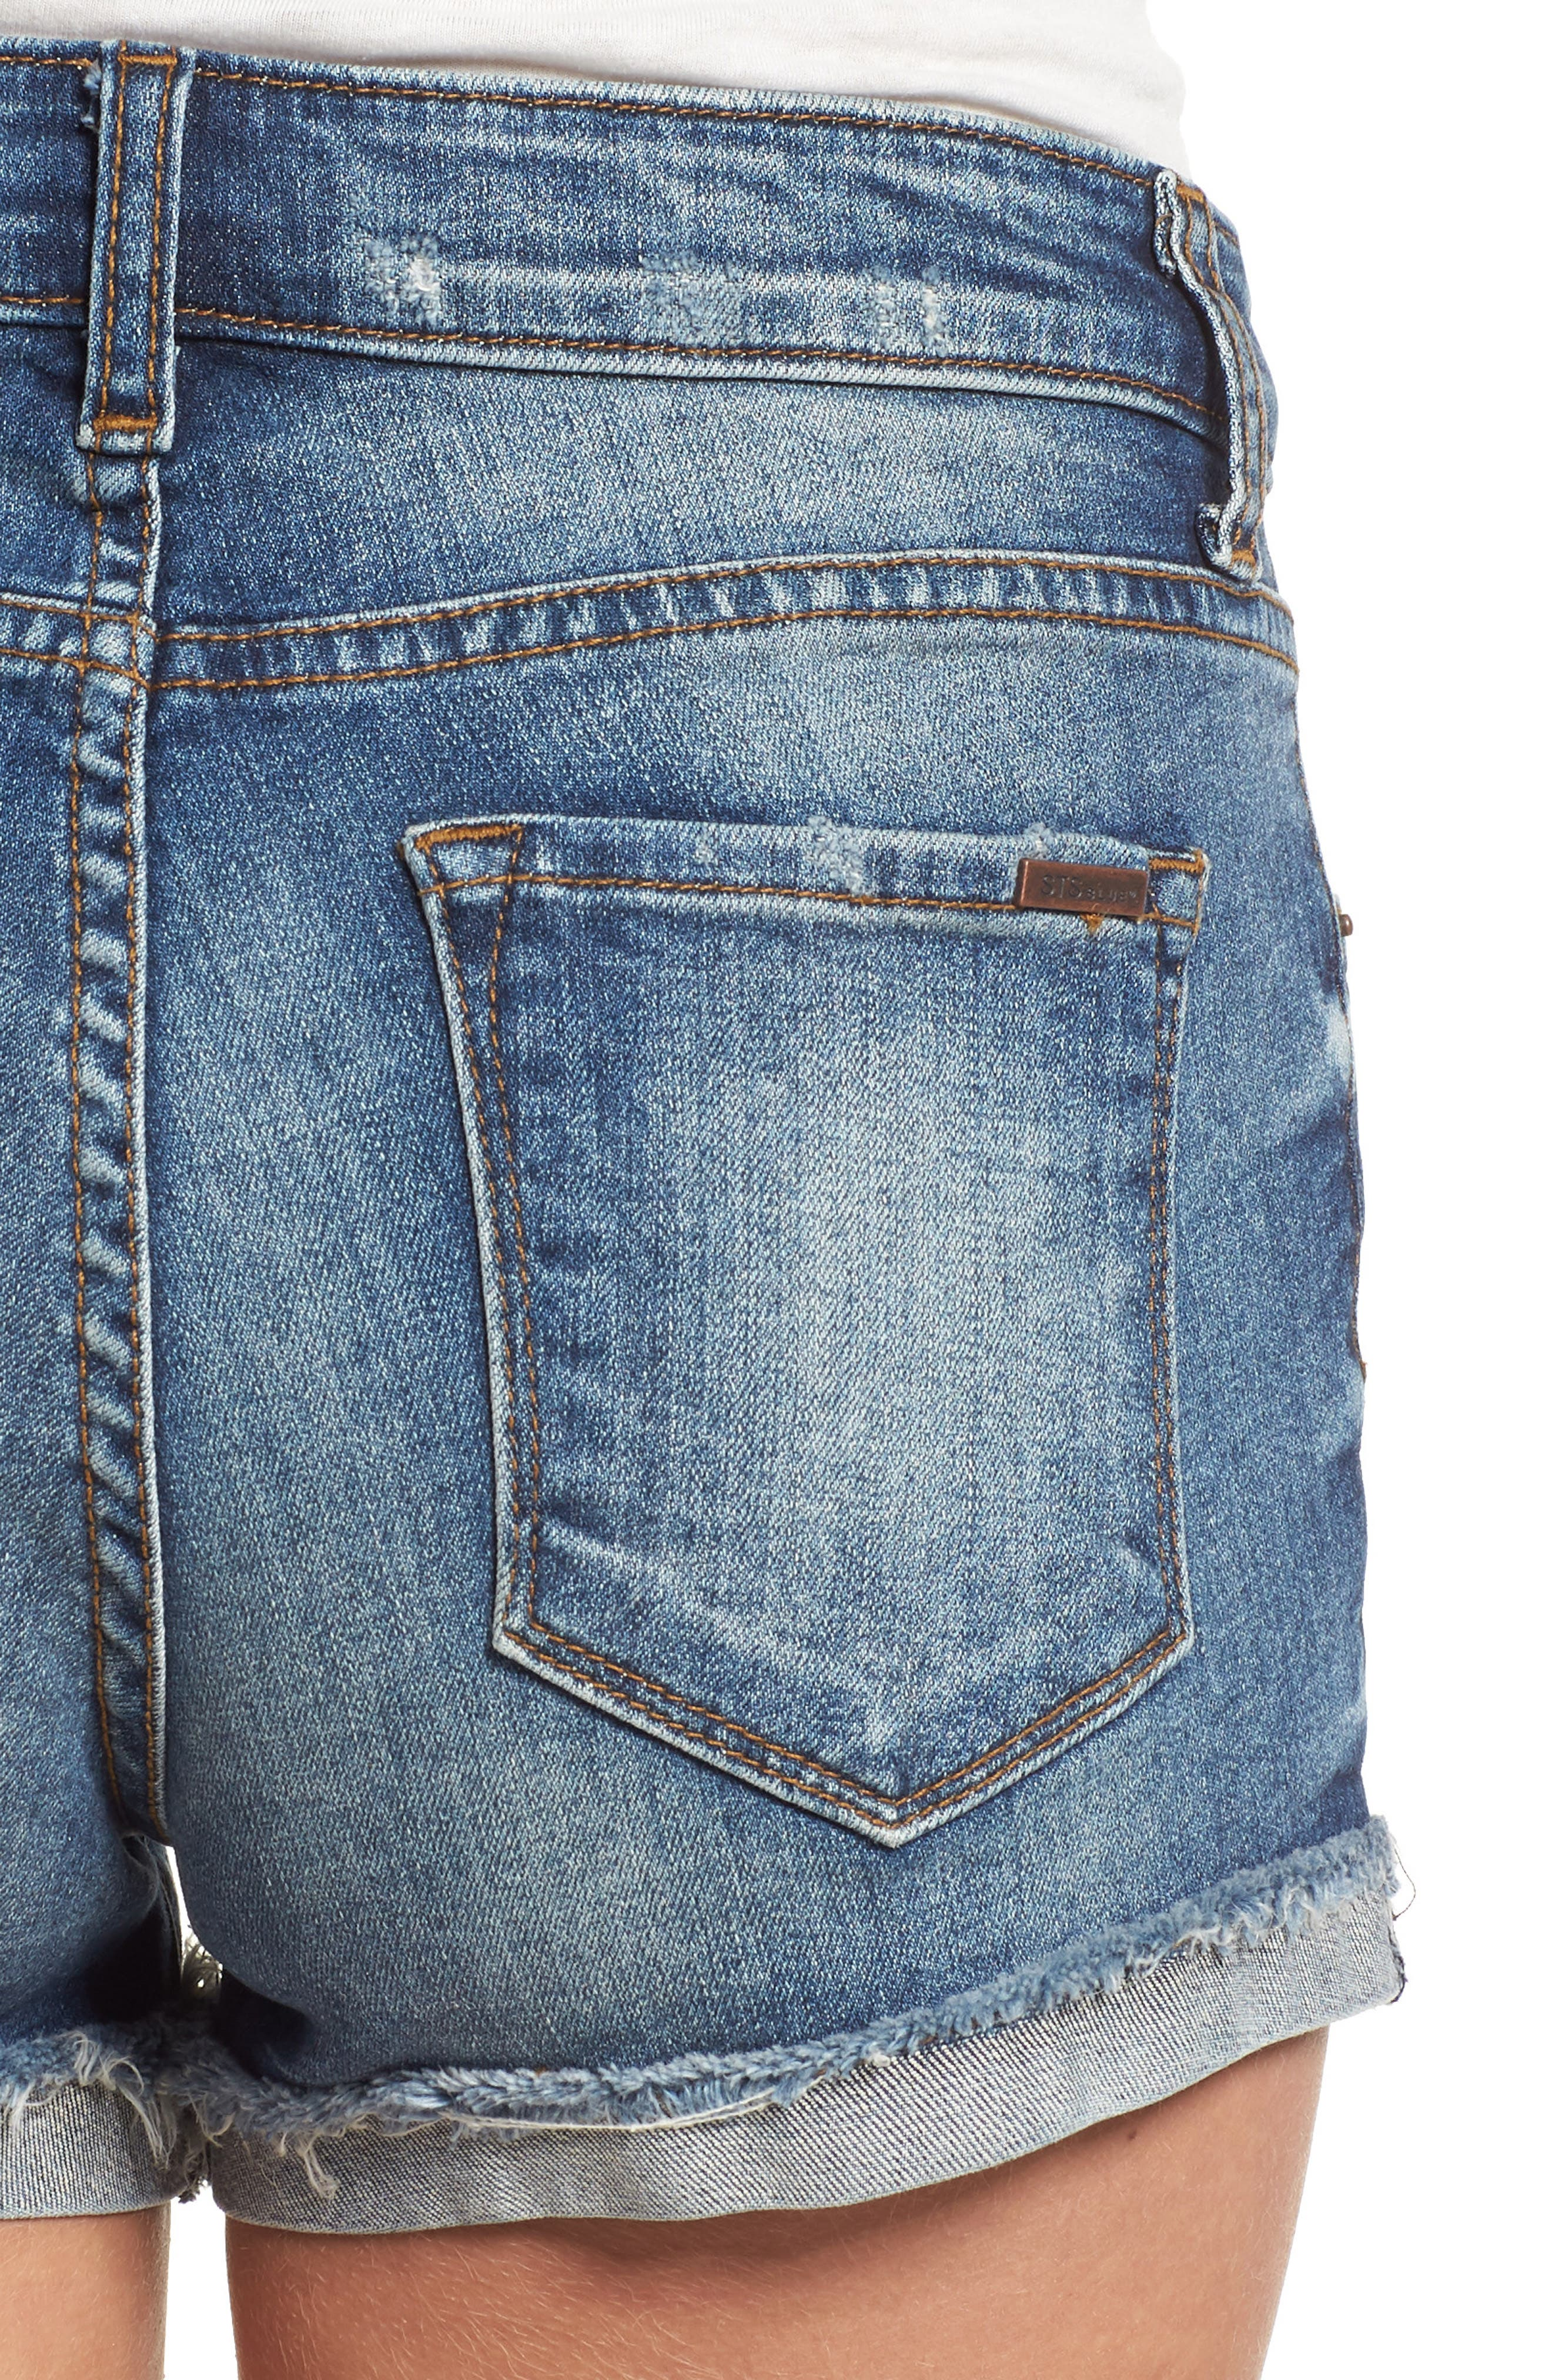 Boyfriend Denim Shorts,                             Alternate thumbnail 4, color,                             400